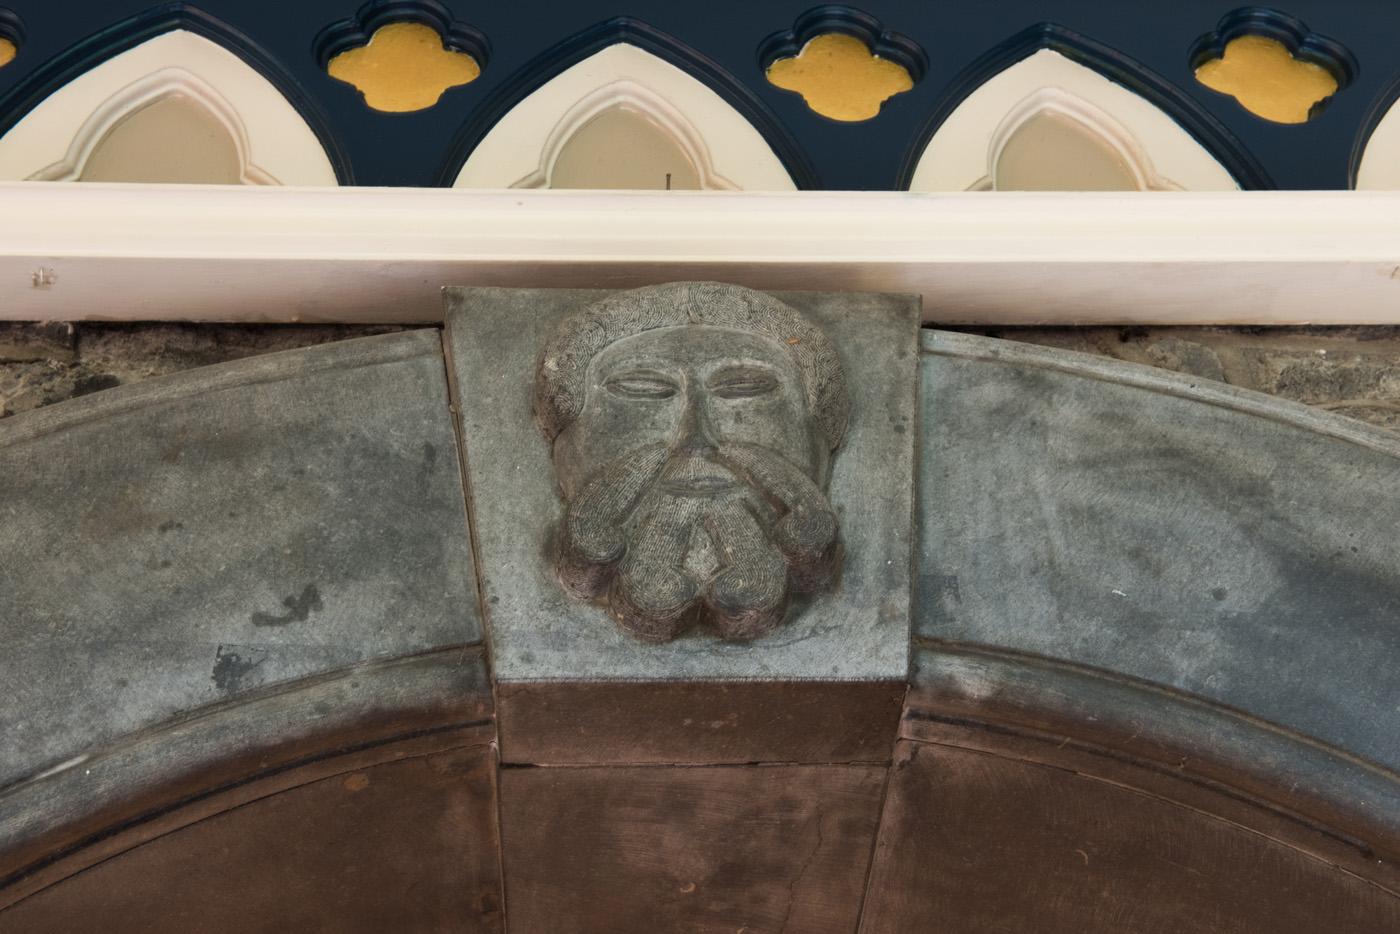 Leinster Stone-266.jpg